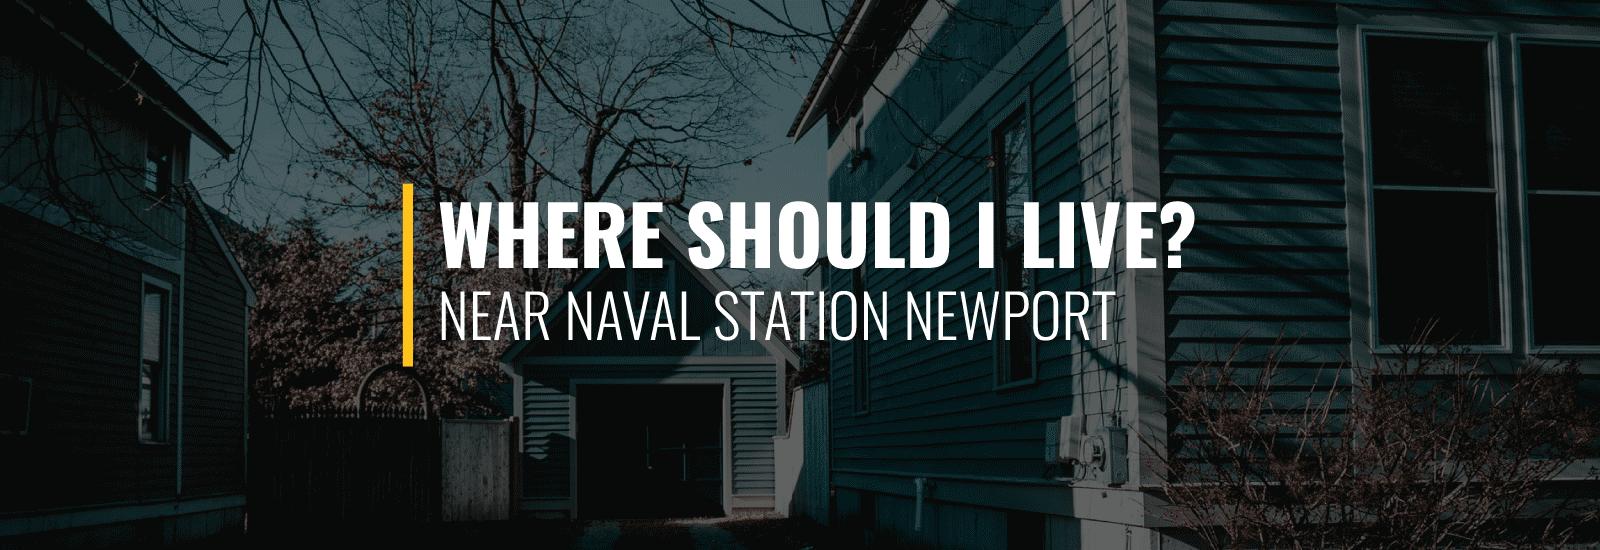 Where Should I Live Near Naval Station Newport?